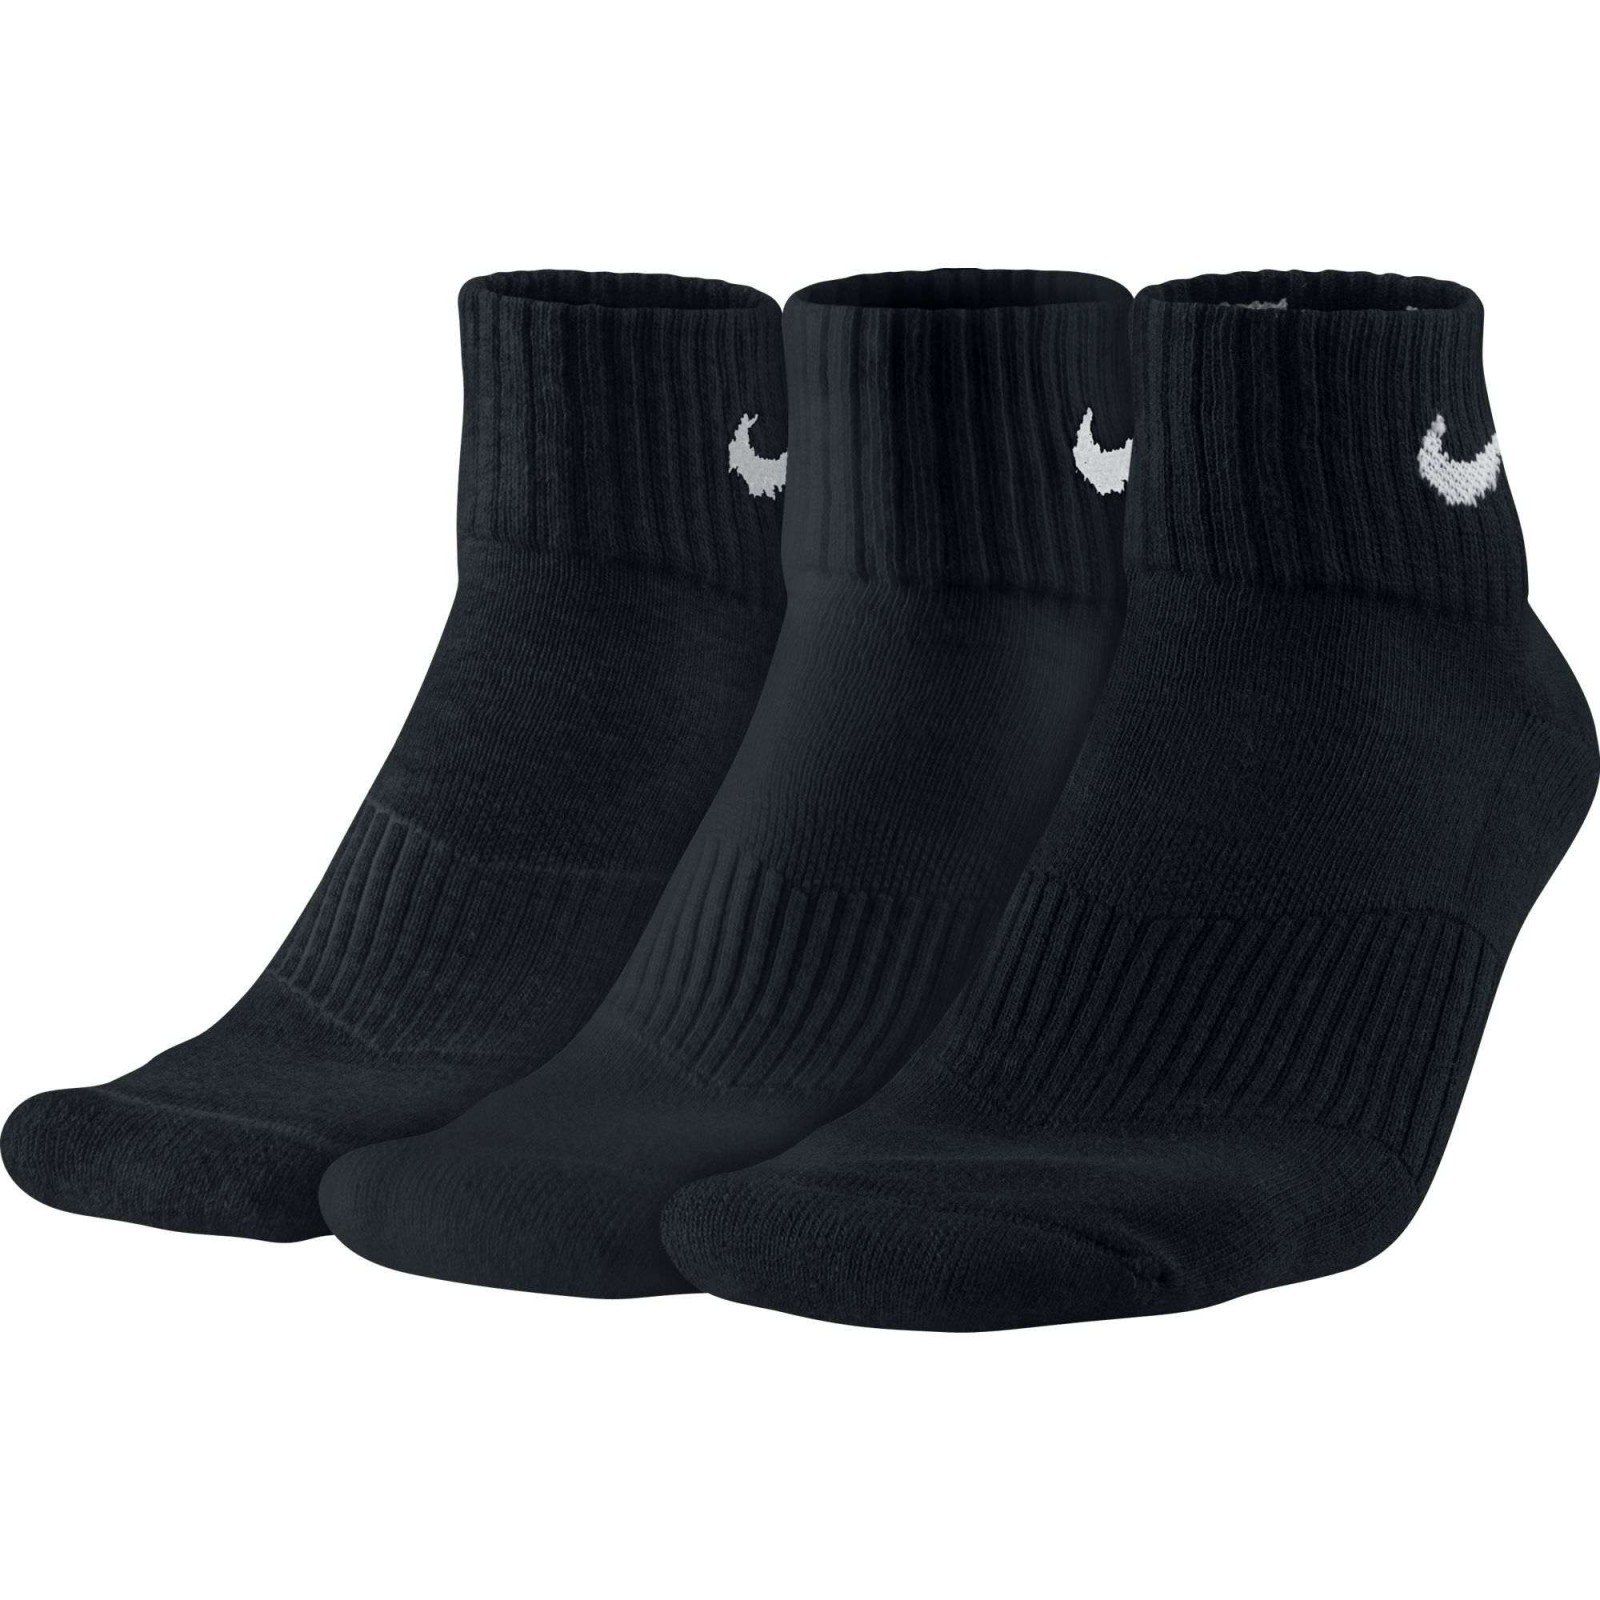 ae310bc73a4 Pánské ponožky Nike Cushion QUArter 3 páry